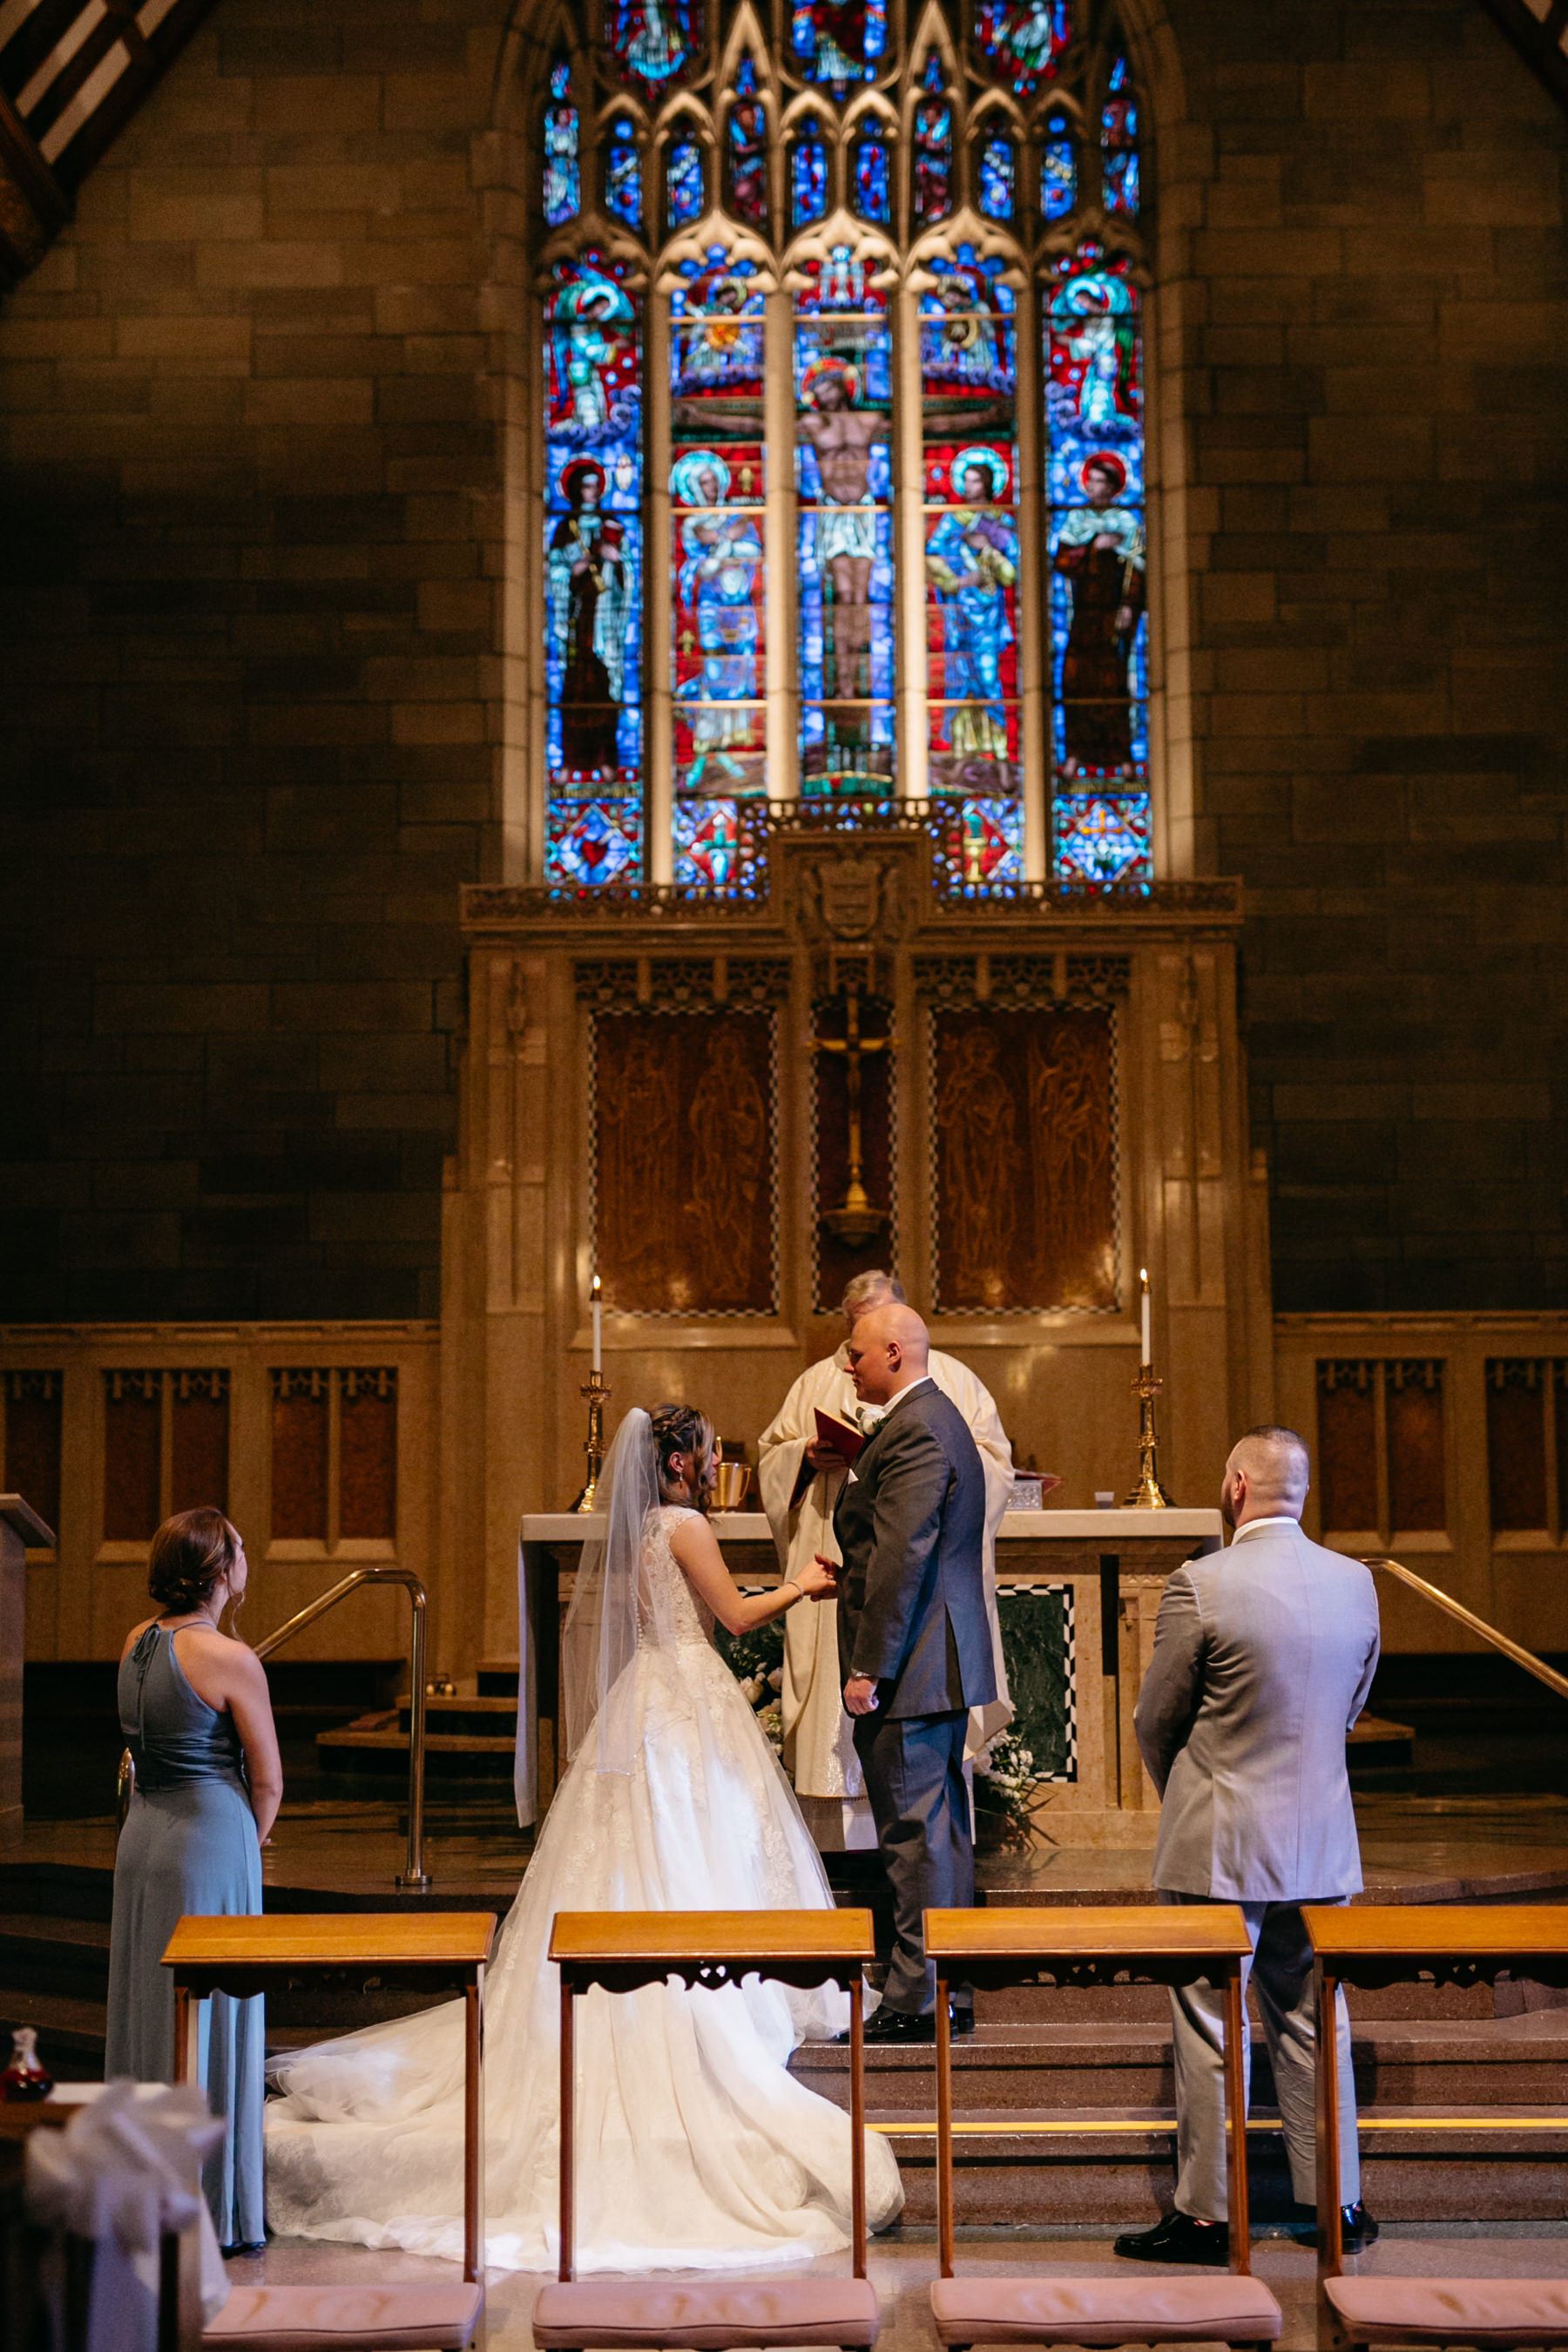 Quincy Ma Massachusetts Wedding Dedham Boston Granie Links Wedding New England Catholic Cathedral Liz Osban Photography 48.jpg